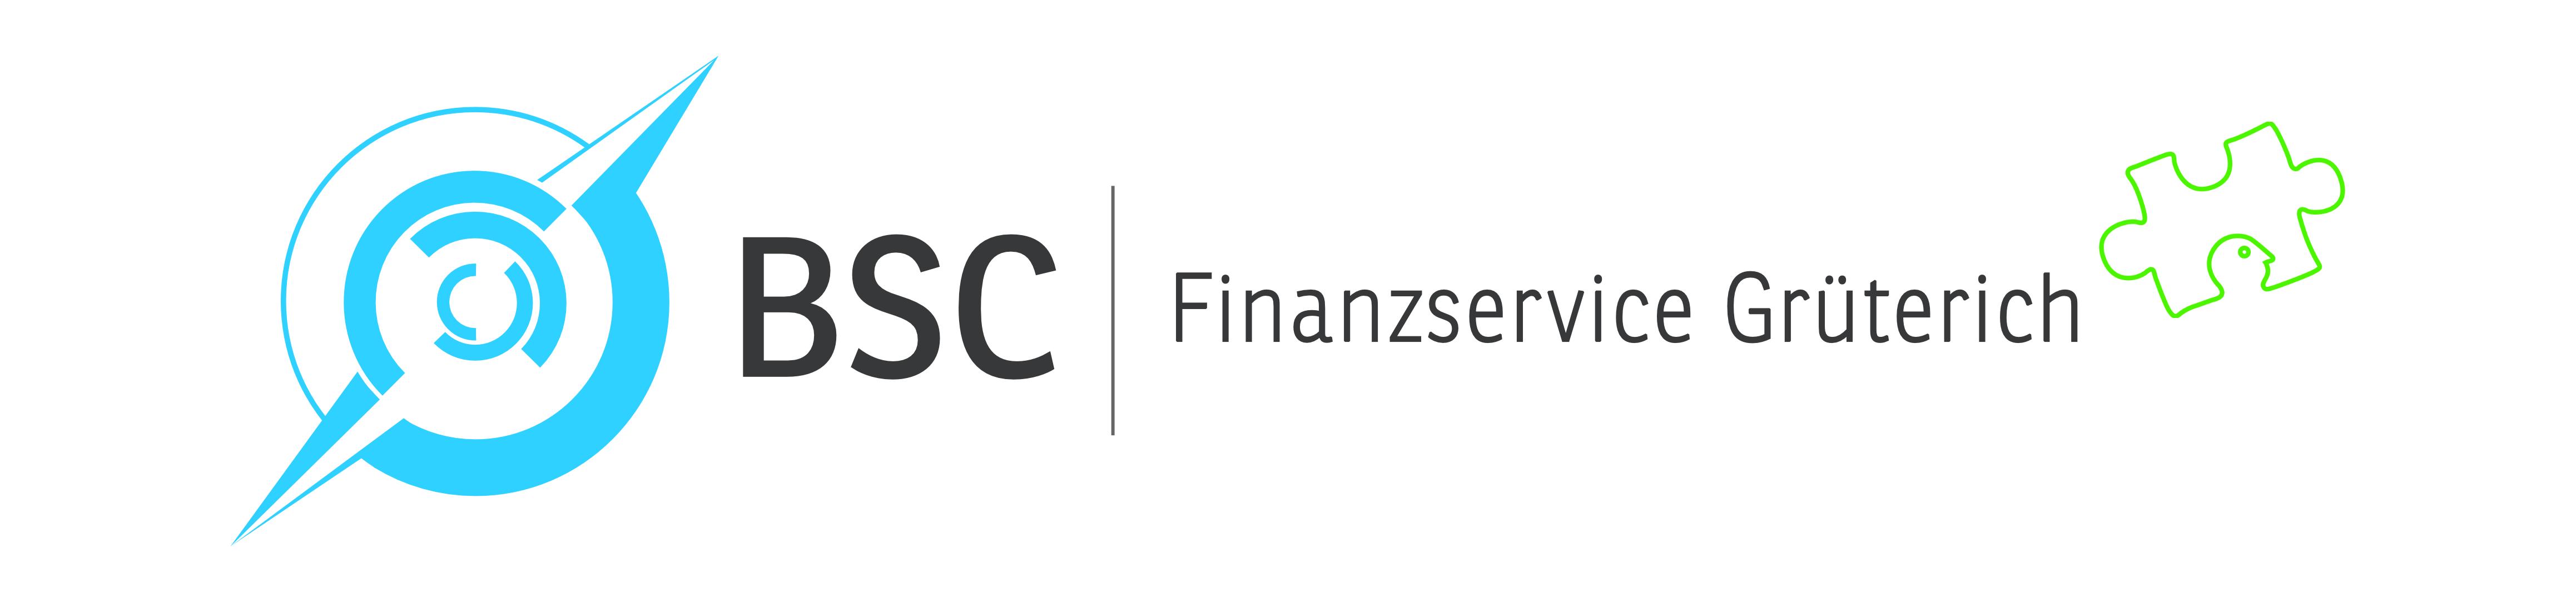 Finanzfitness